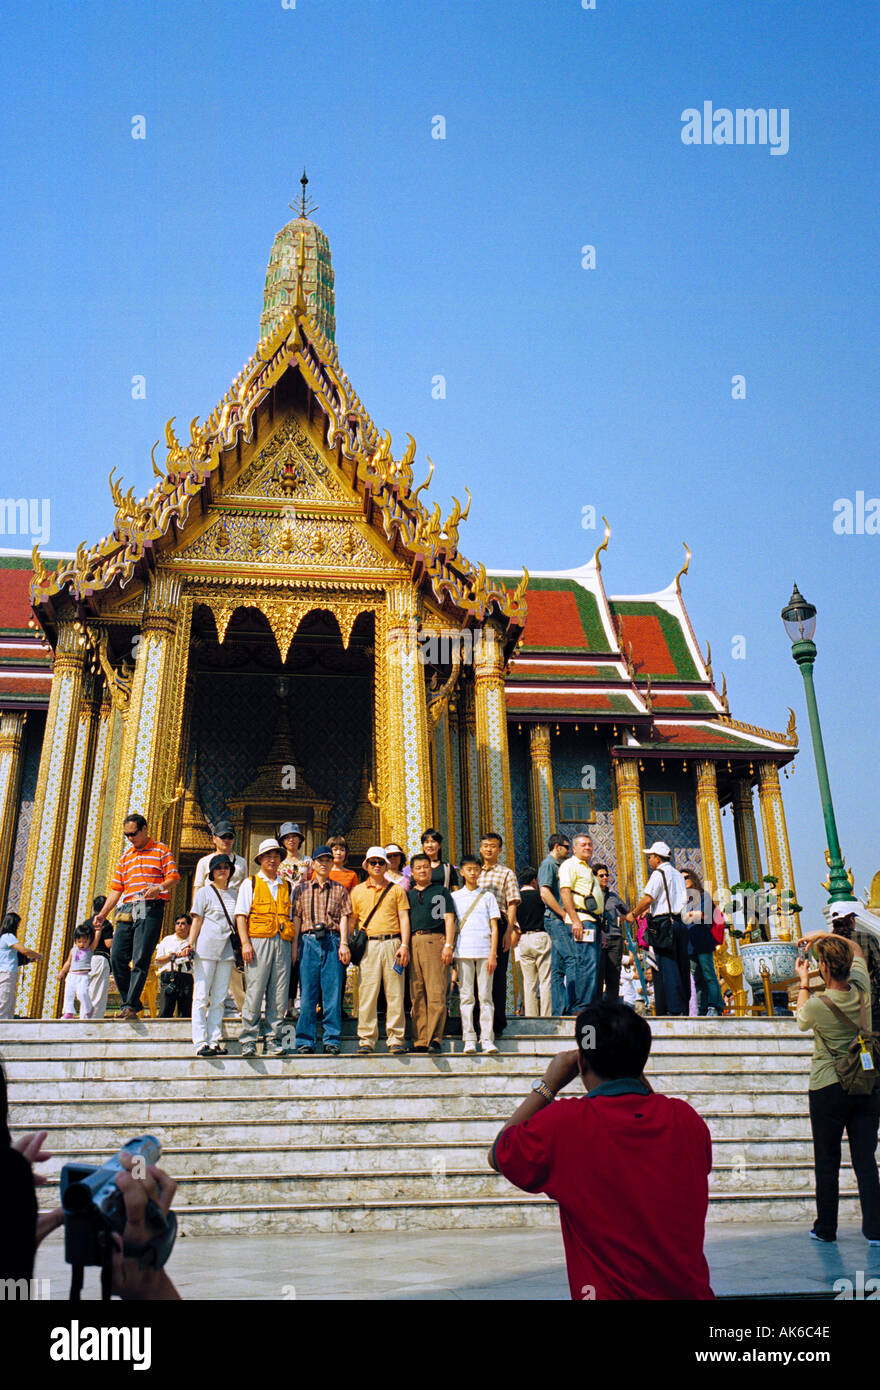 Royal Grand Palace Bangkok Thailand - A tour group photo being taken on the steps of the Royal Pantheon - Stock Image